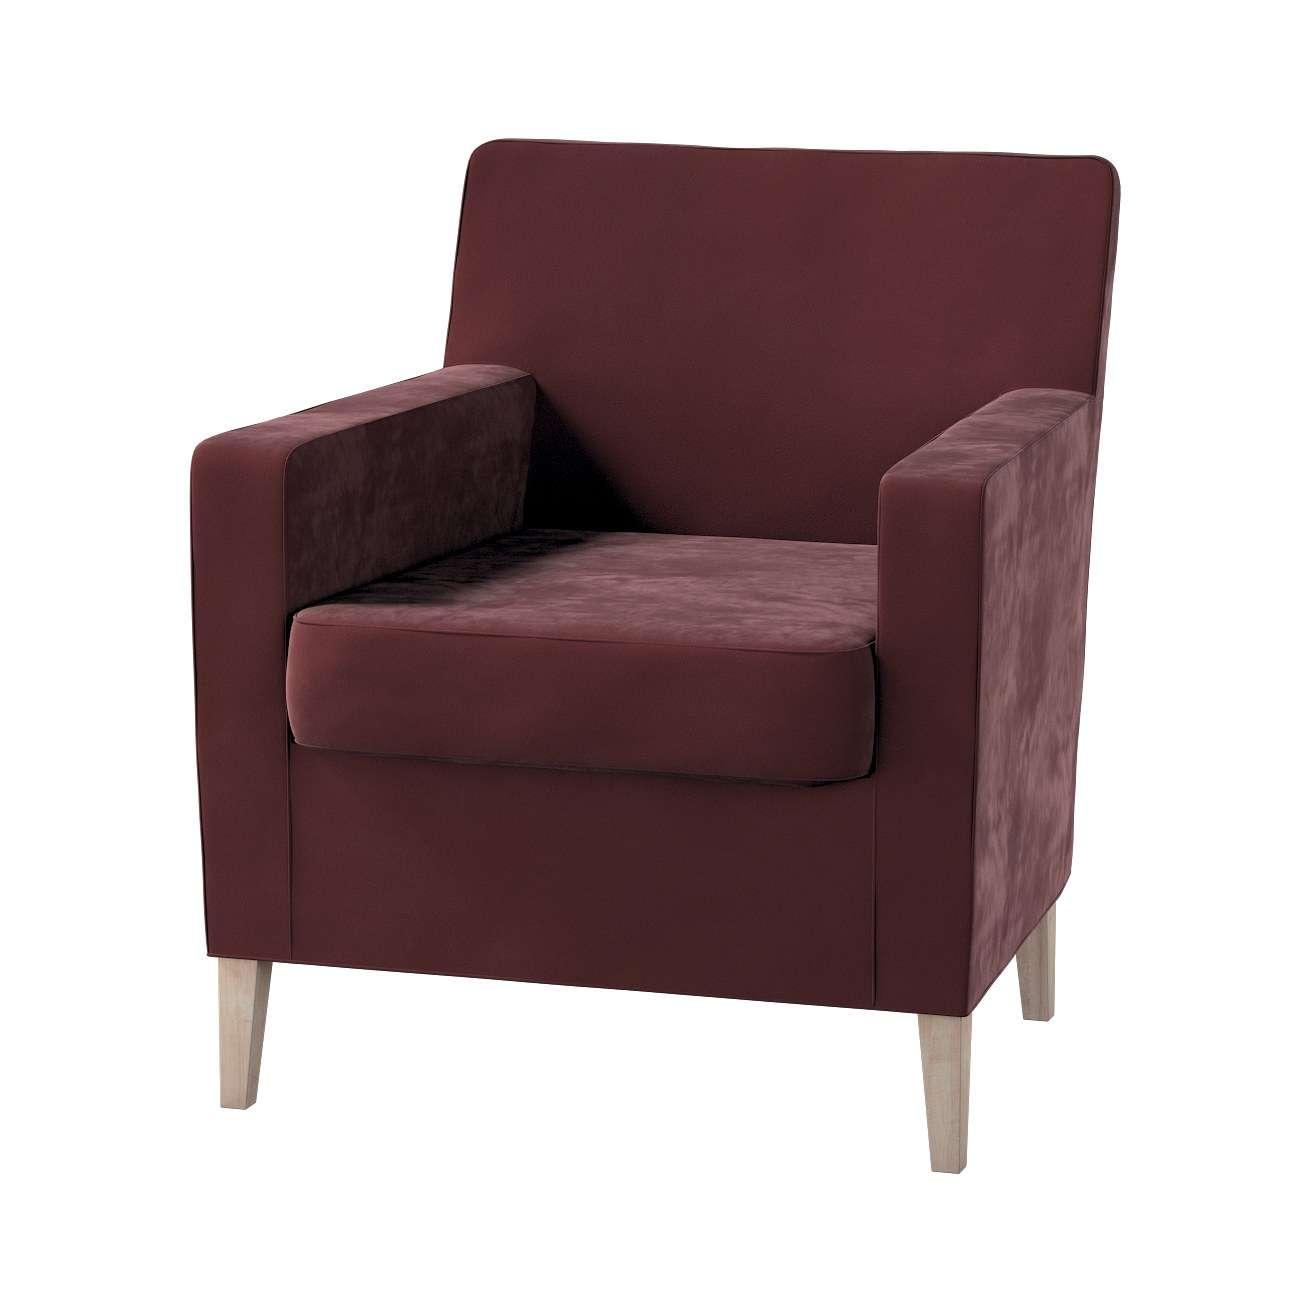 Pokrowiec na fotel Karlstad w kolekcji Velvet, tkanina: 704-26